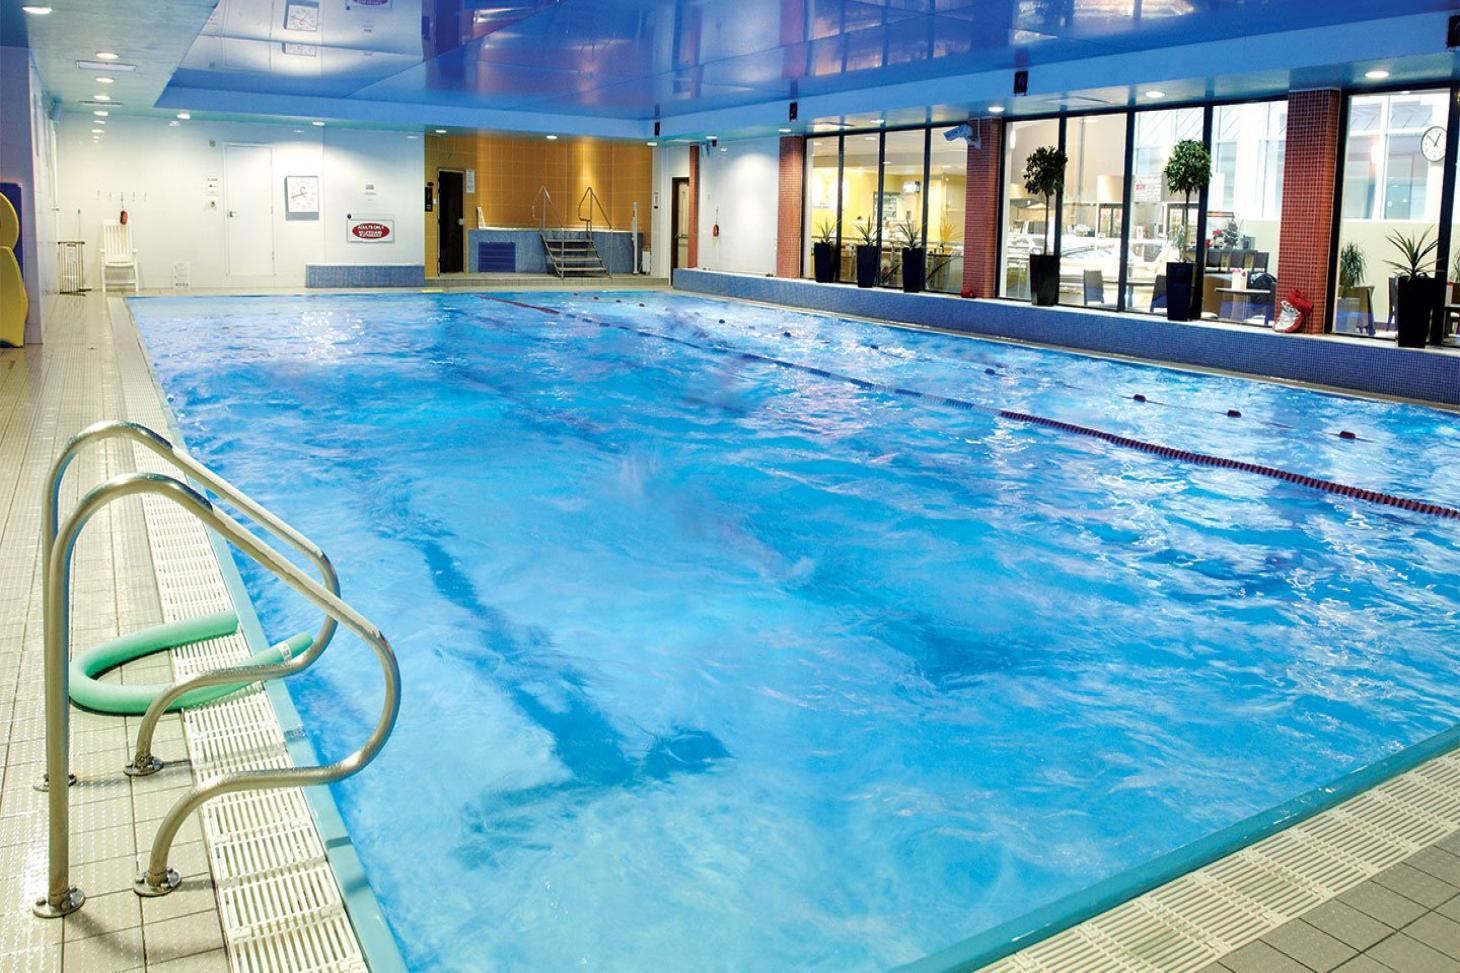 David Lloyd Maidenhead Indoor swimming pool